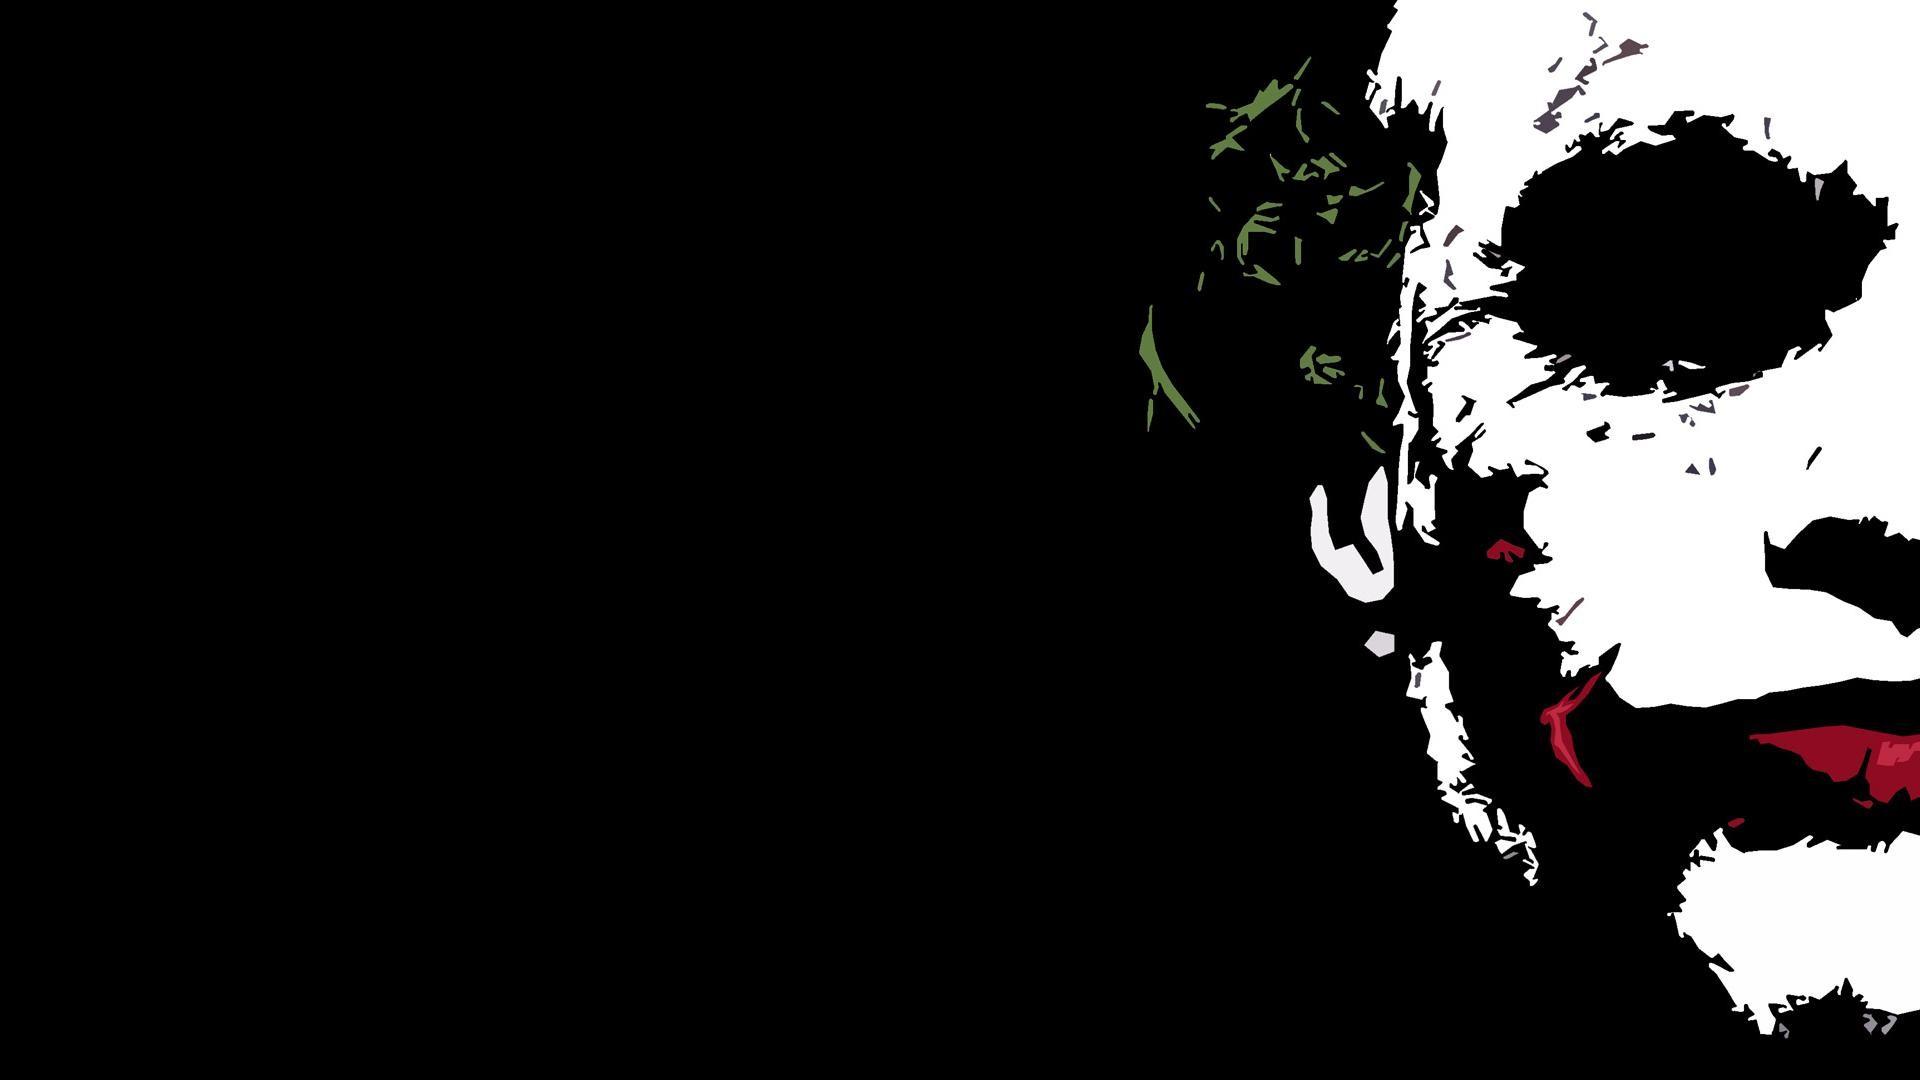 Batman The Joker Heath Ledger wallpaper 1920x1080 193328 1920x1080